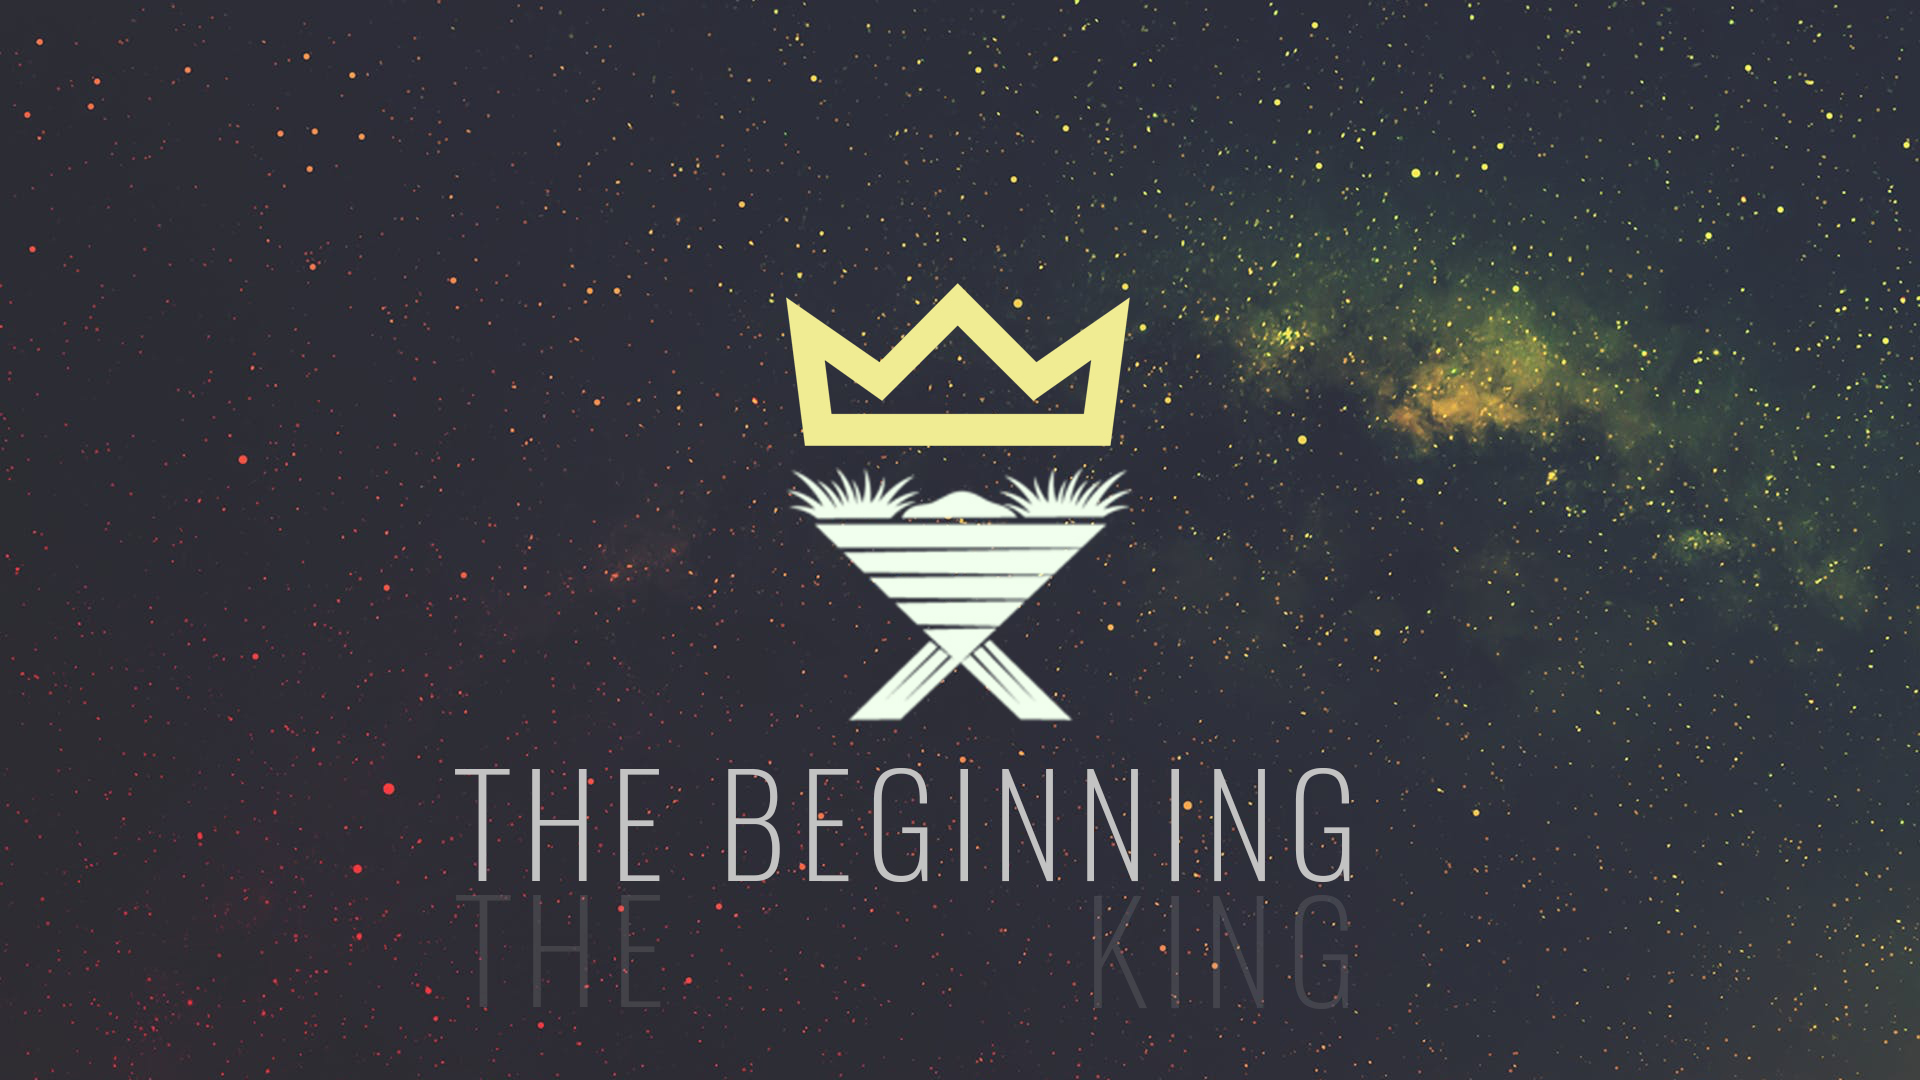 1920x1080 The Beginning.jpg